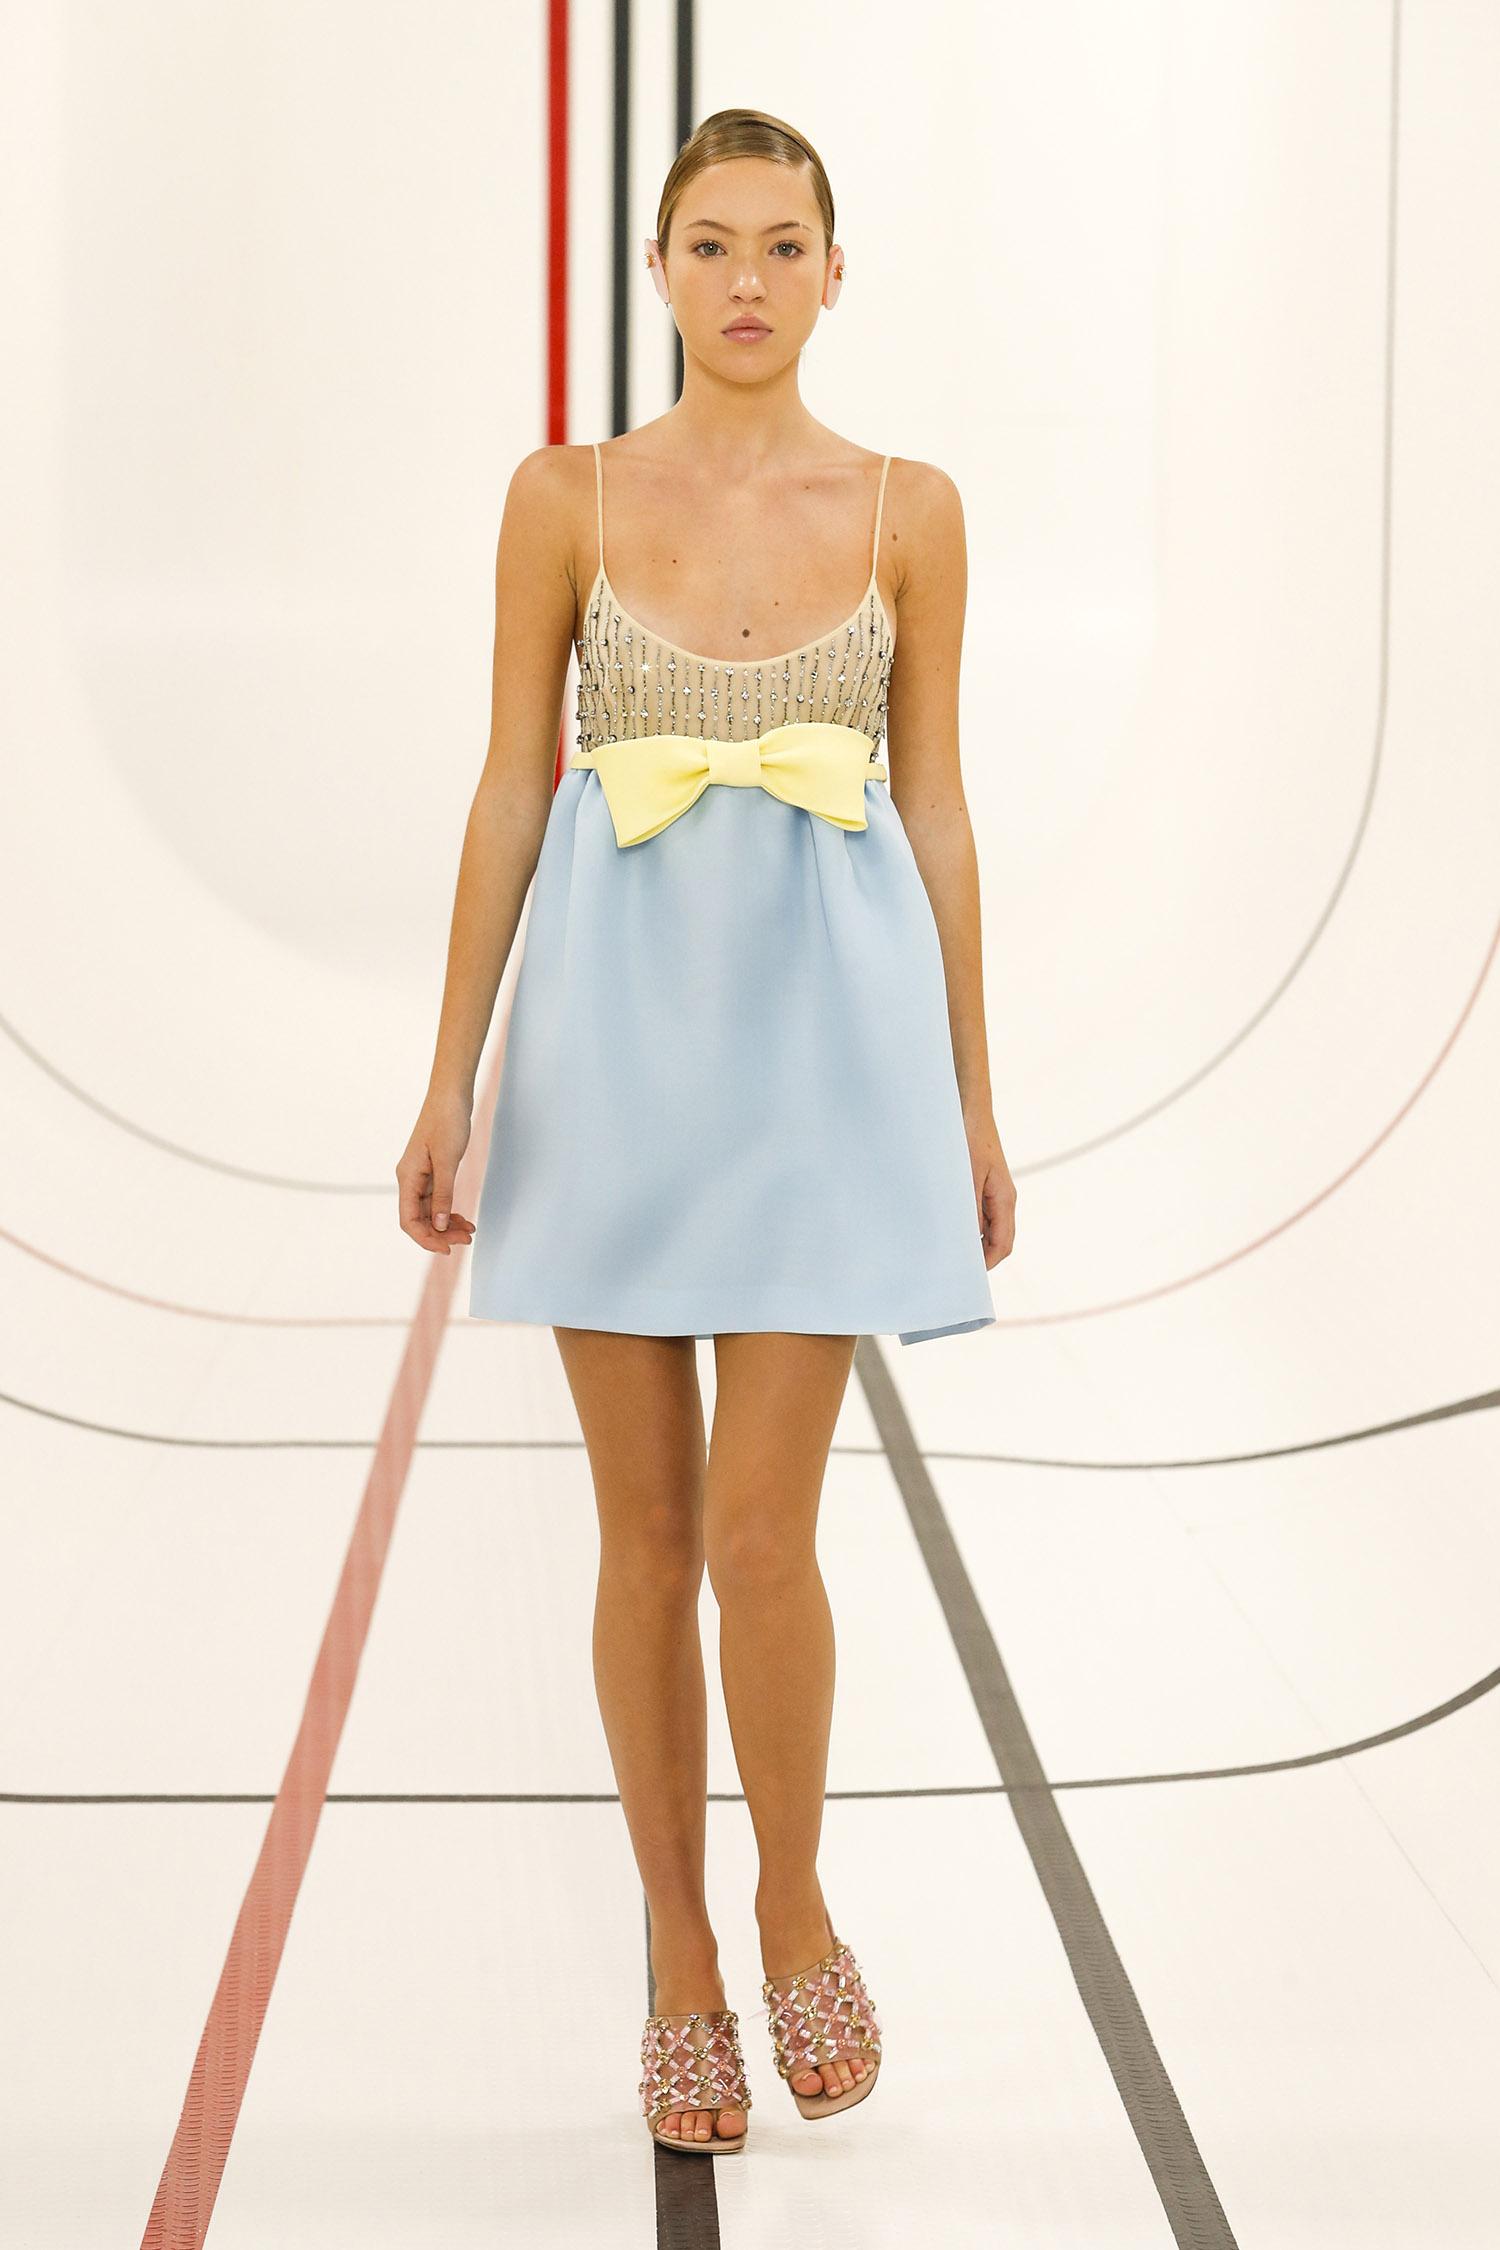 For Miu Miu, fashion is a spectator sport